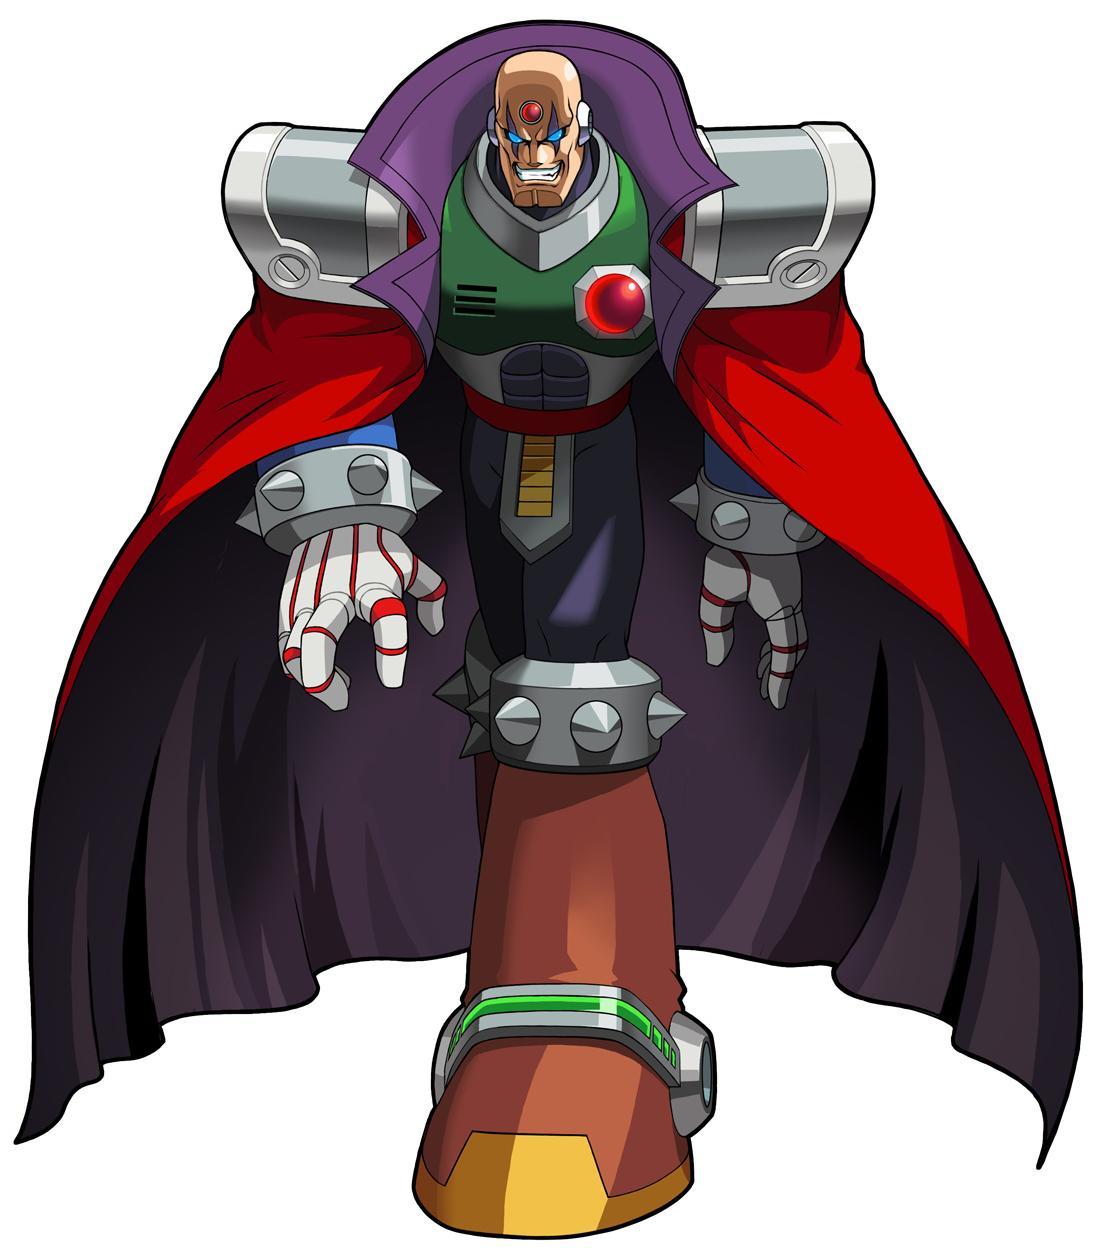 Sigma (Mega Man X) | Villains Wiki | FANDOM powered by Wikia